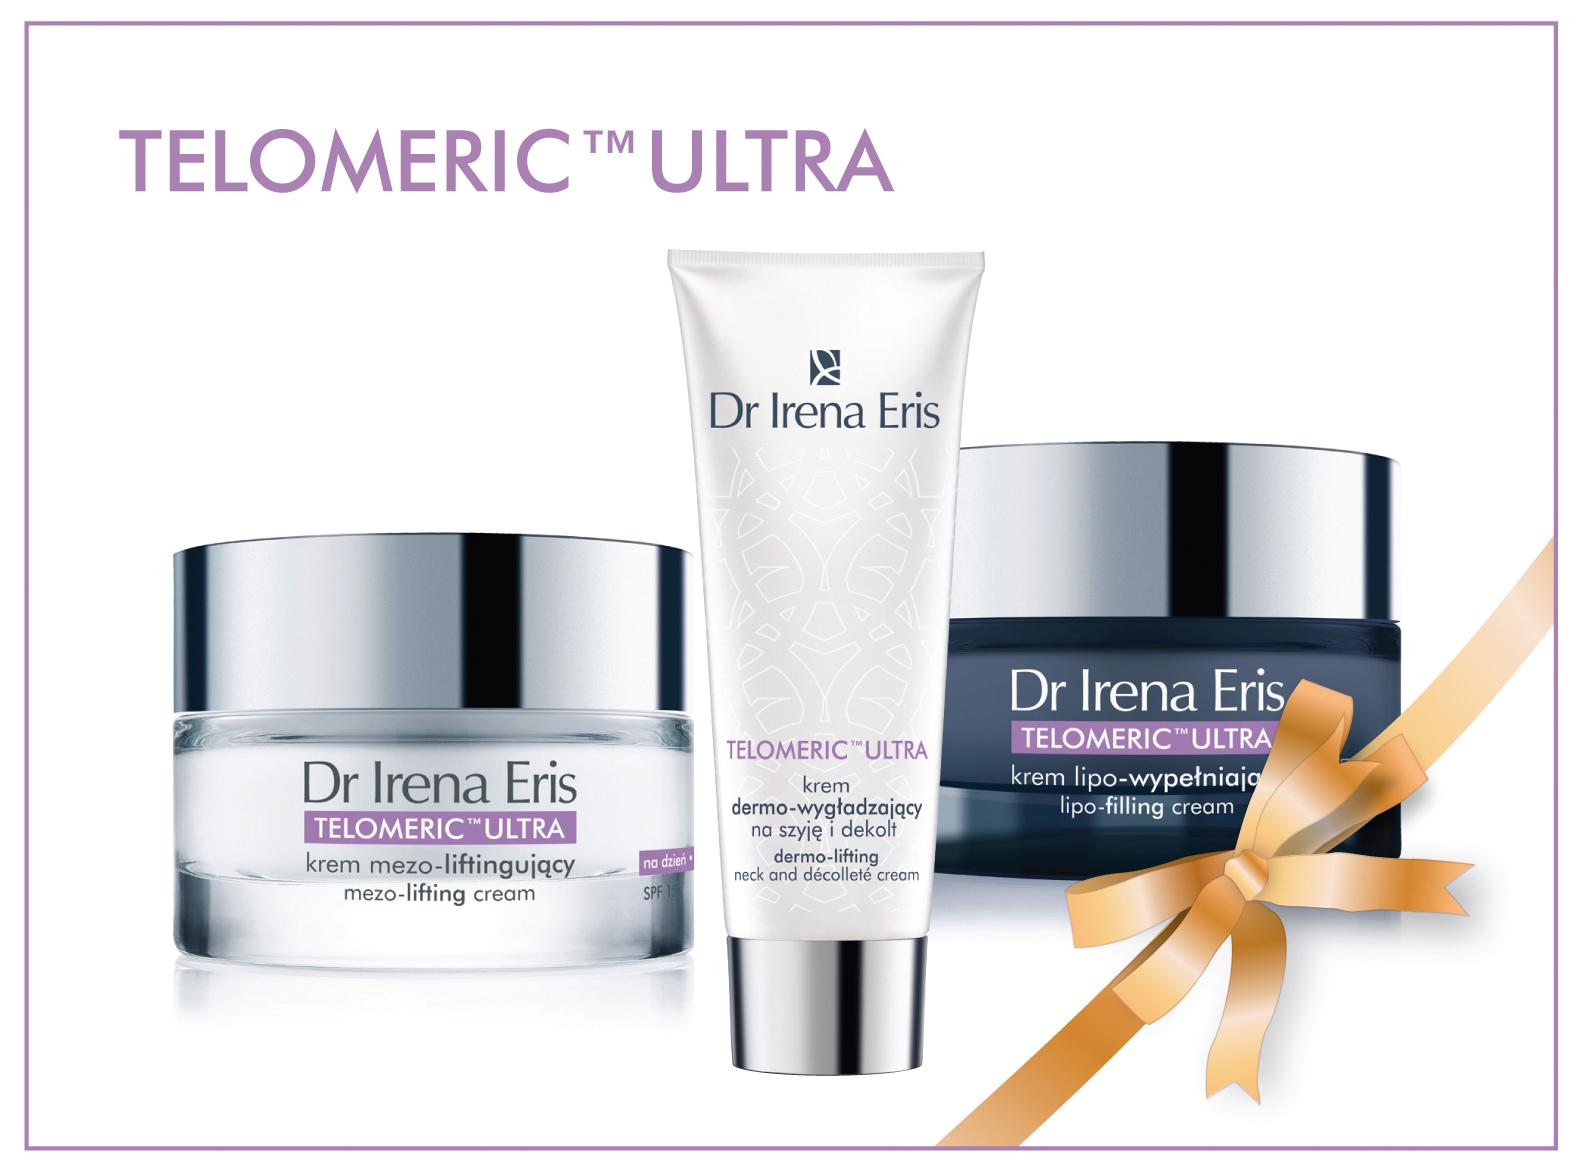 Dr Irena Eris TELOMERIC™ ULTRA